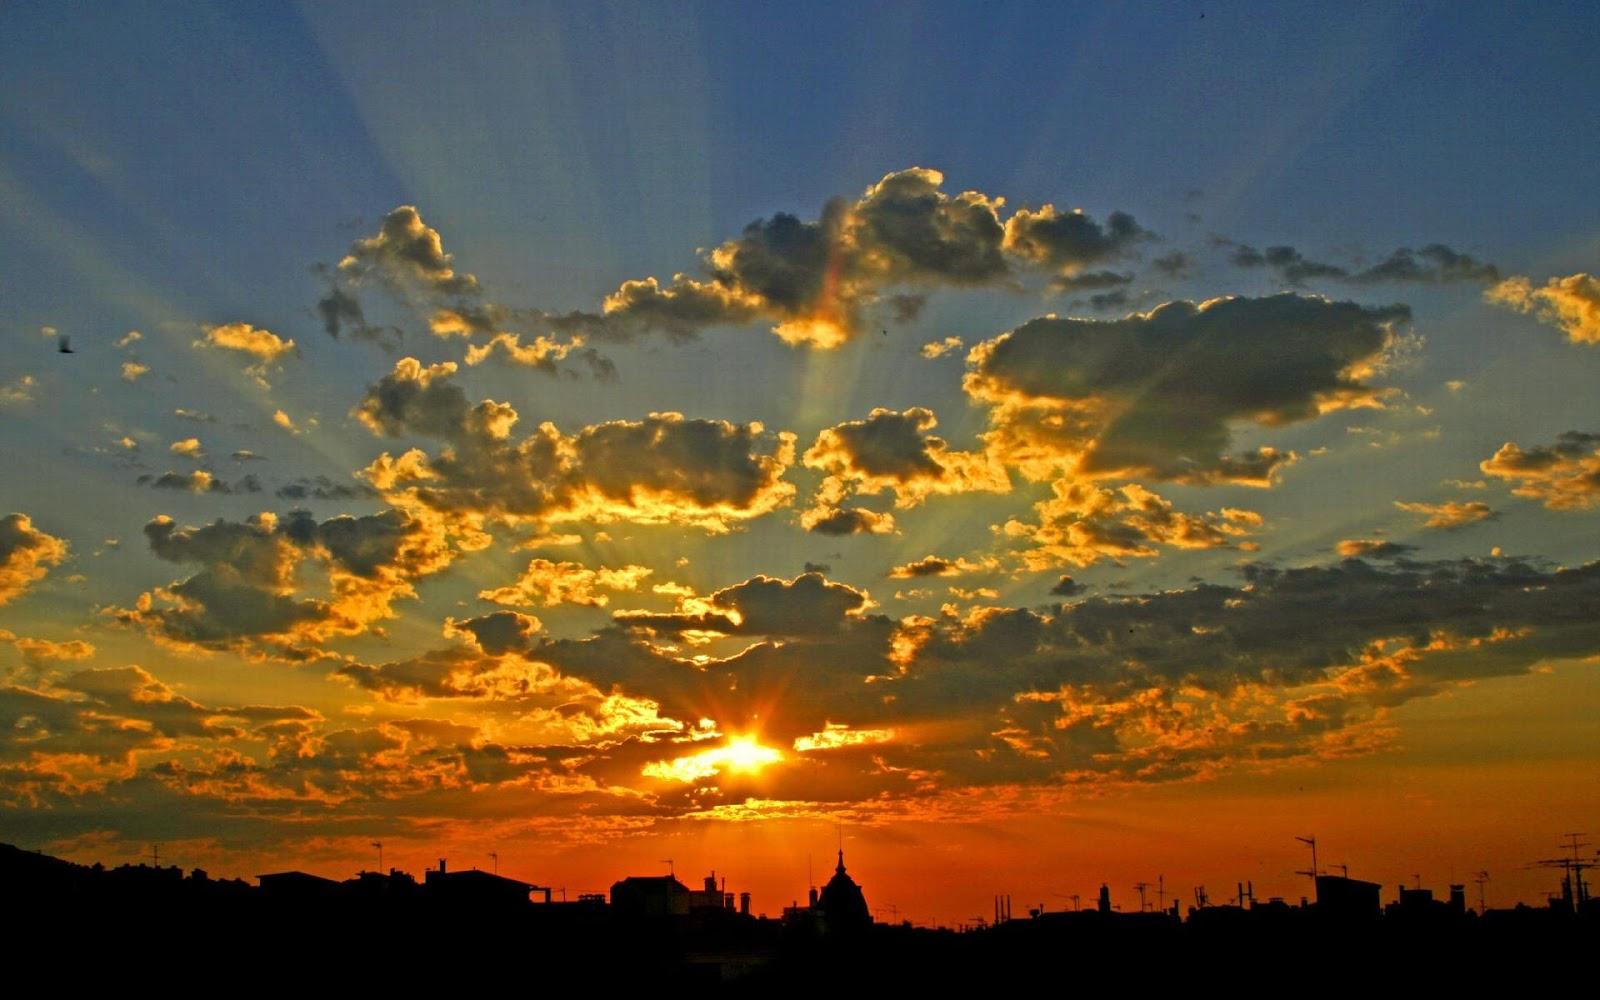 Grimca shpirti, Erjola Kola Sunrise-over-barcelona-3